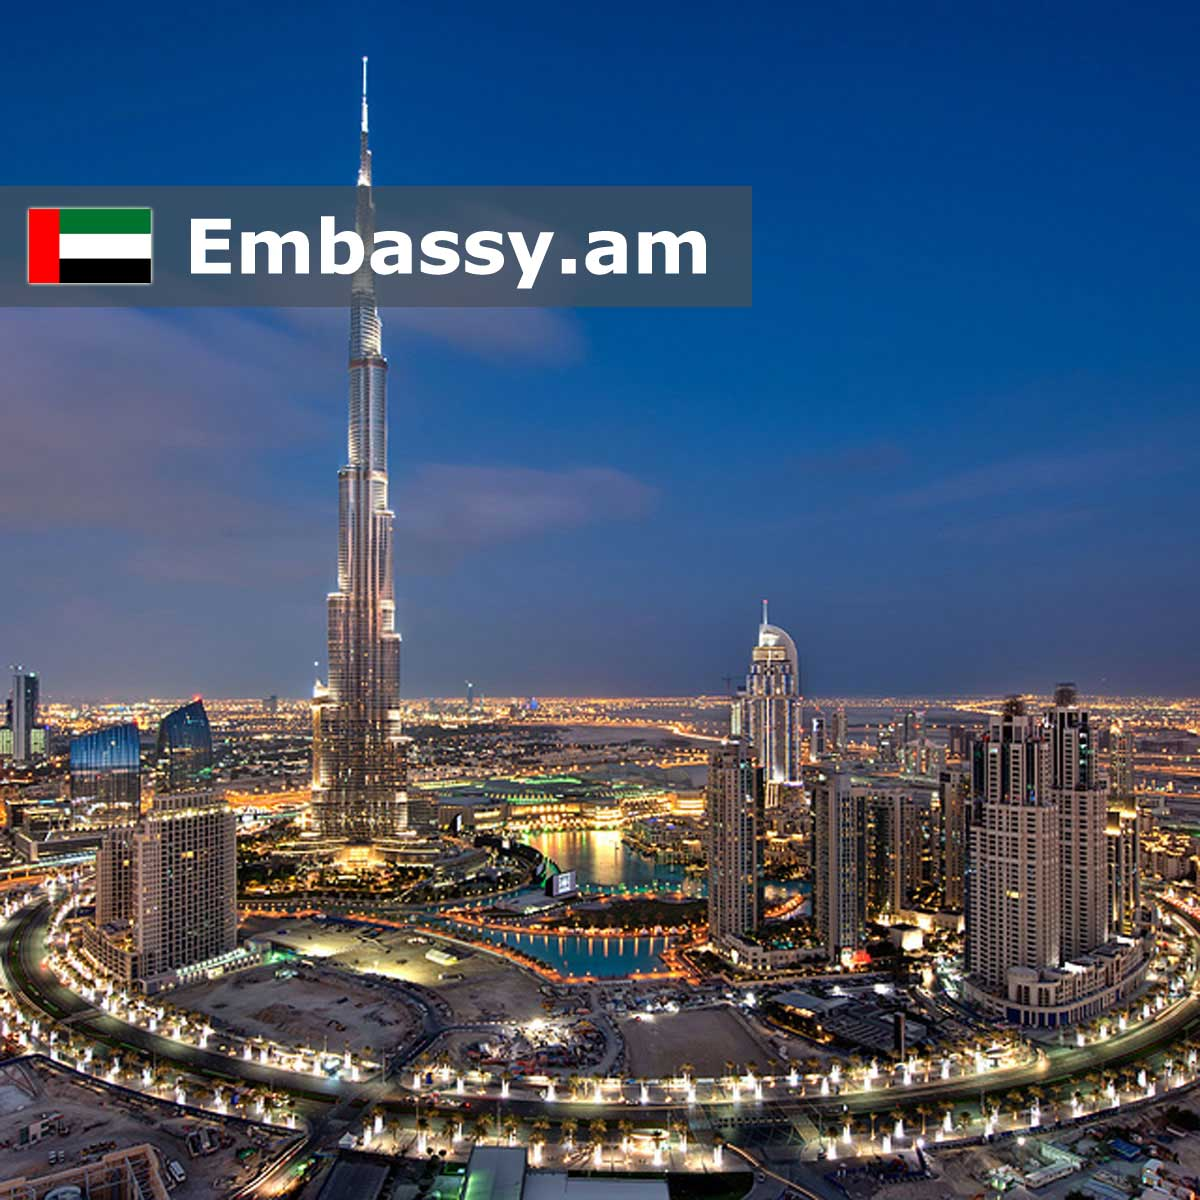 Dubai - Hotels in the United Arab Emirates - Embassy.am